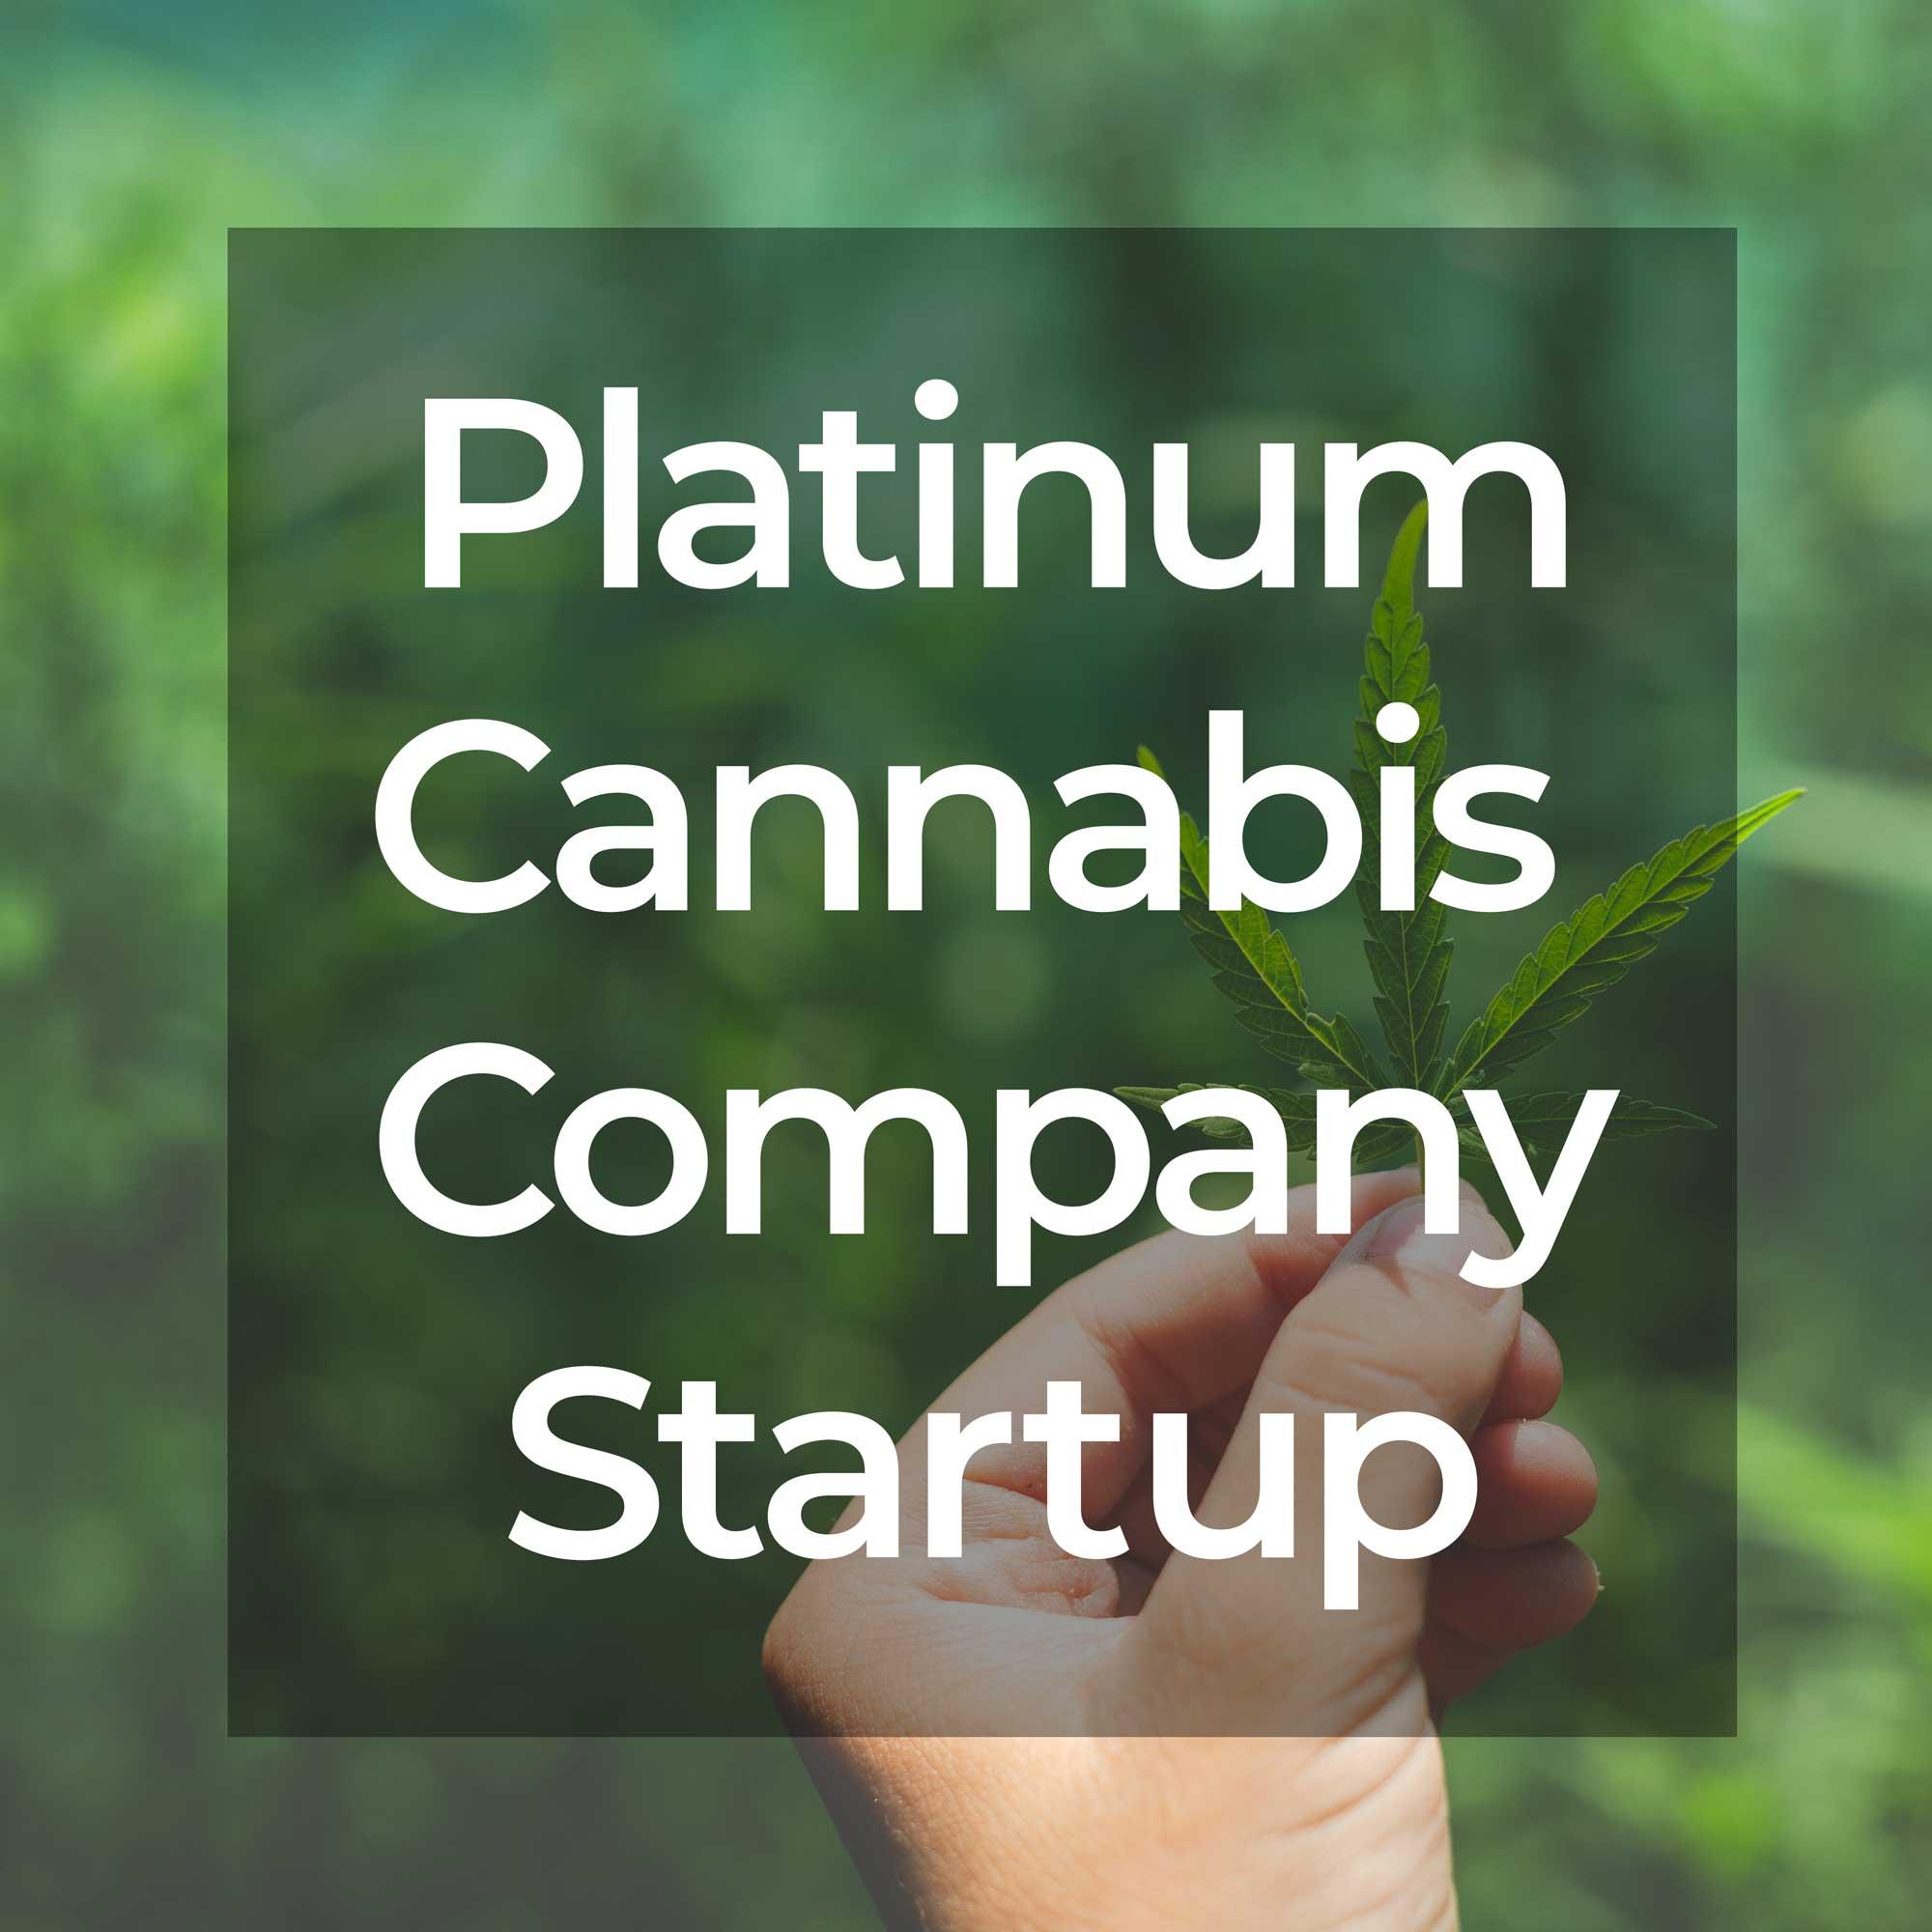 Platinum Cannabis Company Startup